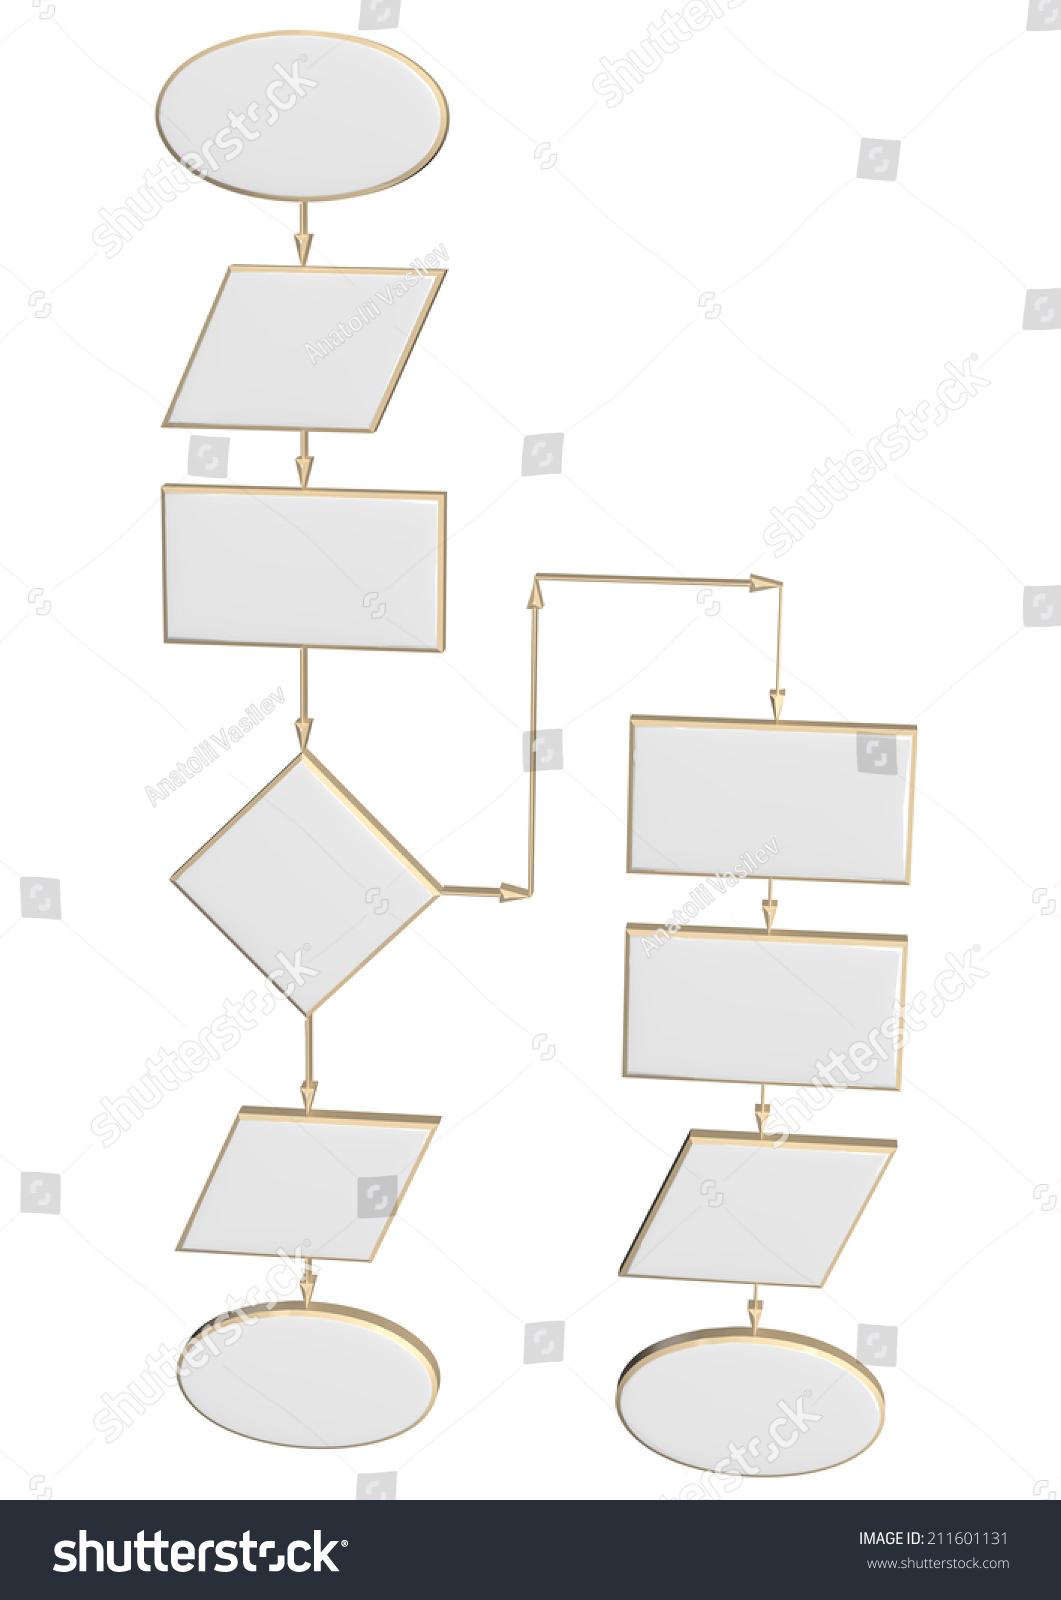 Project flow chart diagram use programming stock illustration project flow chart diagram use for programming nvjuhfo Choice Image